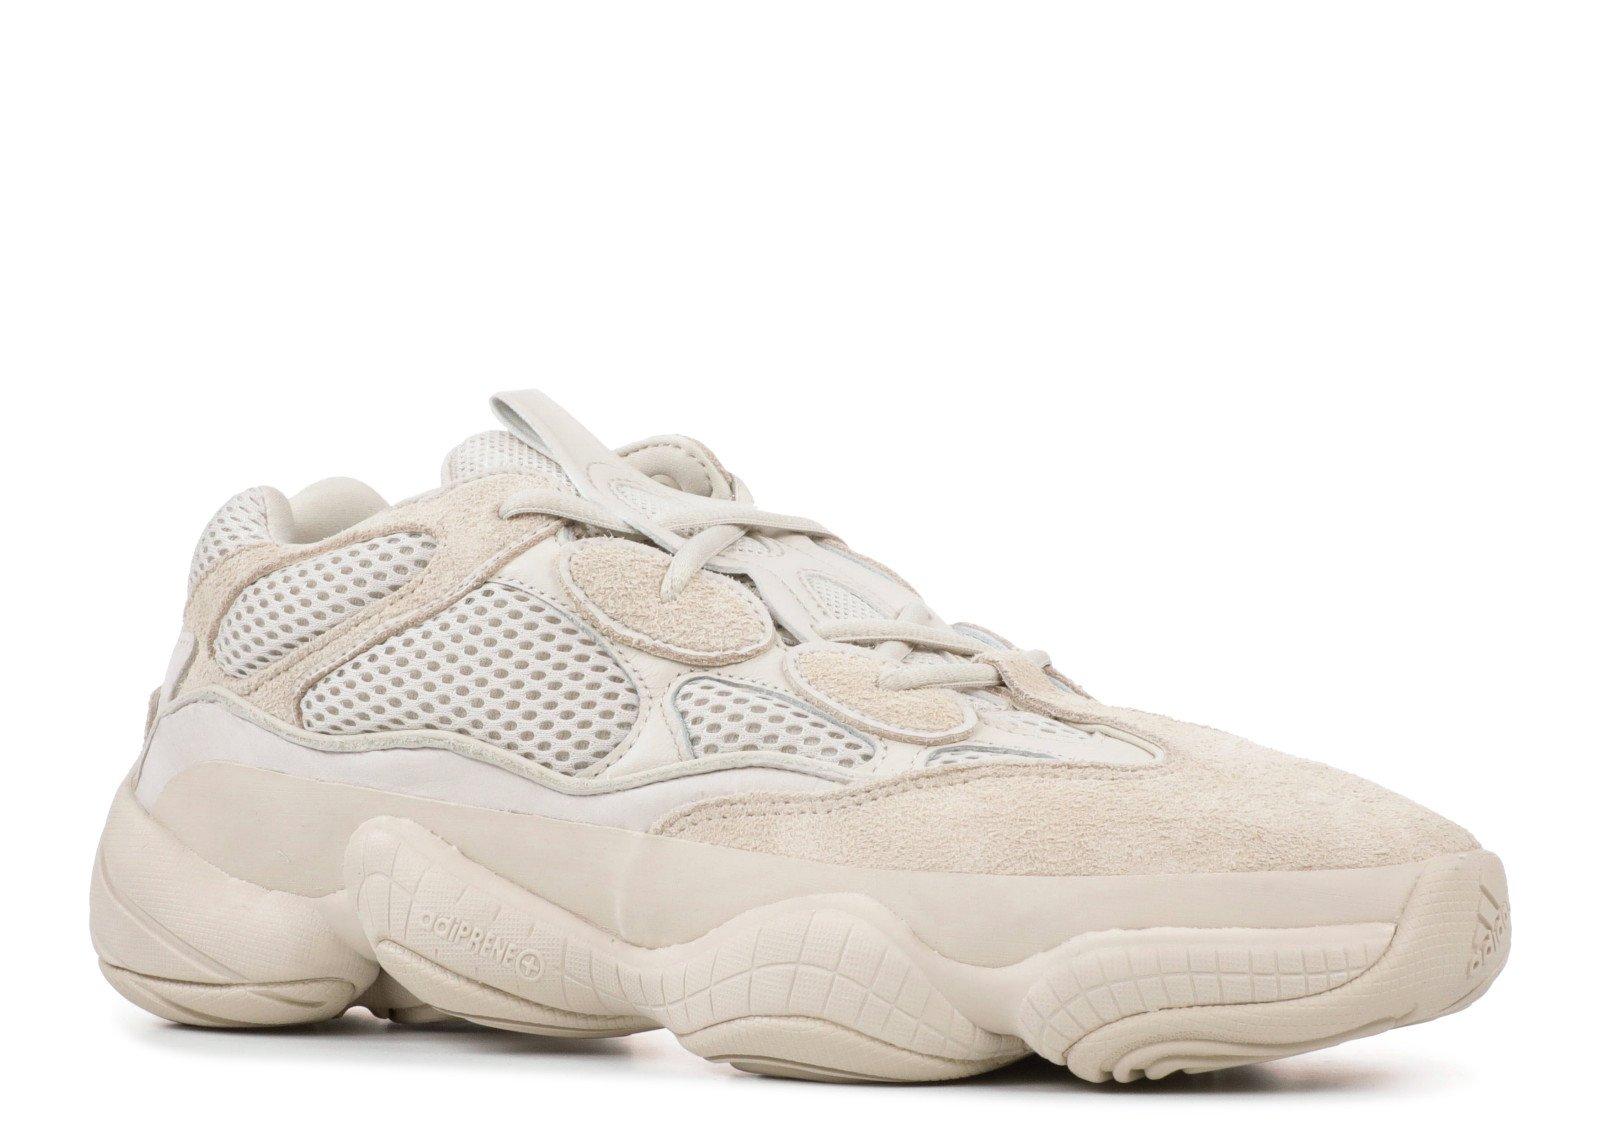 sports shoes 757d3 6a5ad adidas Yeezy Desert Rat 500 'Blush' - DB2908 - Size 5.5-UK